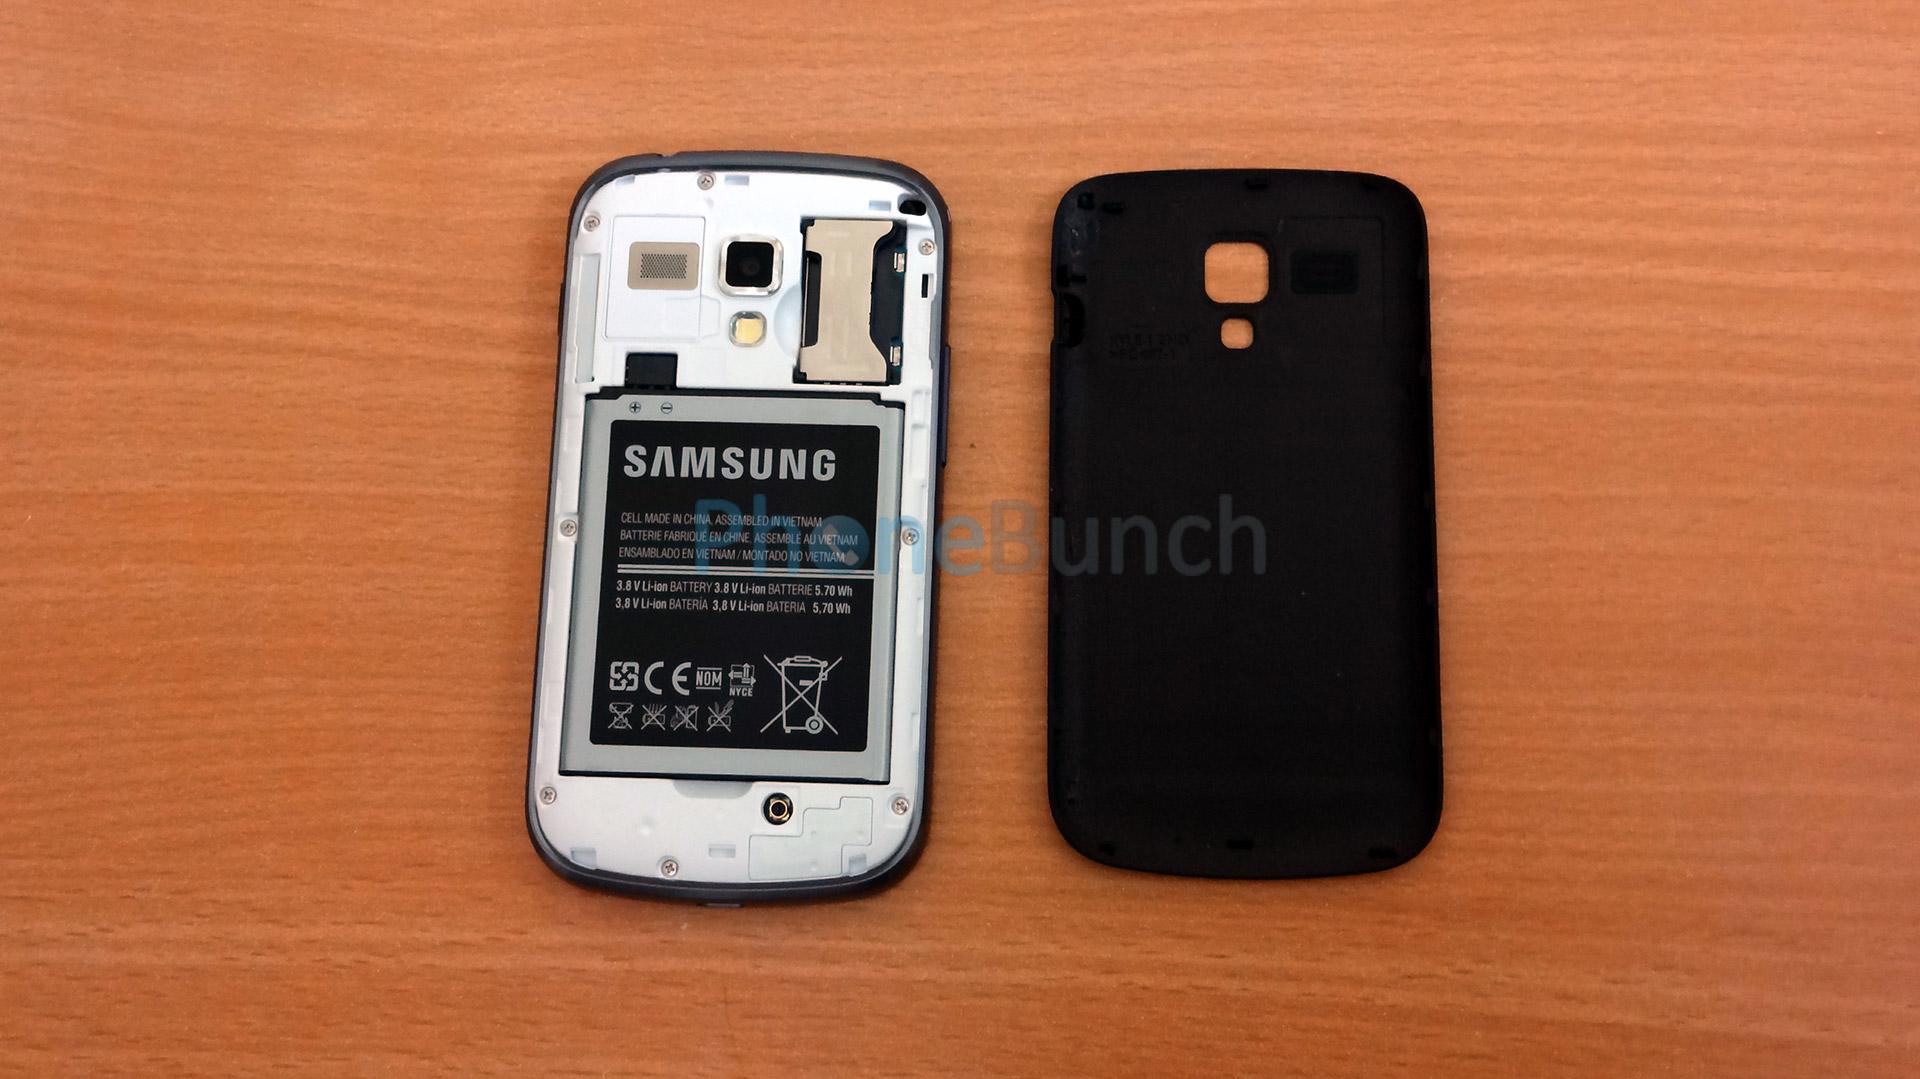 Samsung Galaxy Duos 2 Gt S7582 1920x1079 Download Hd Wallpaper Wallpapertip